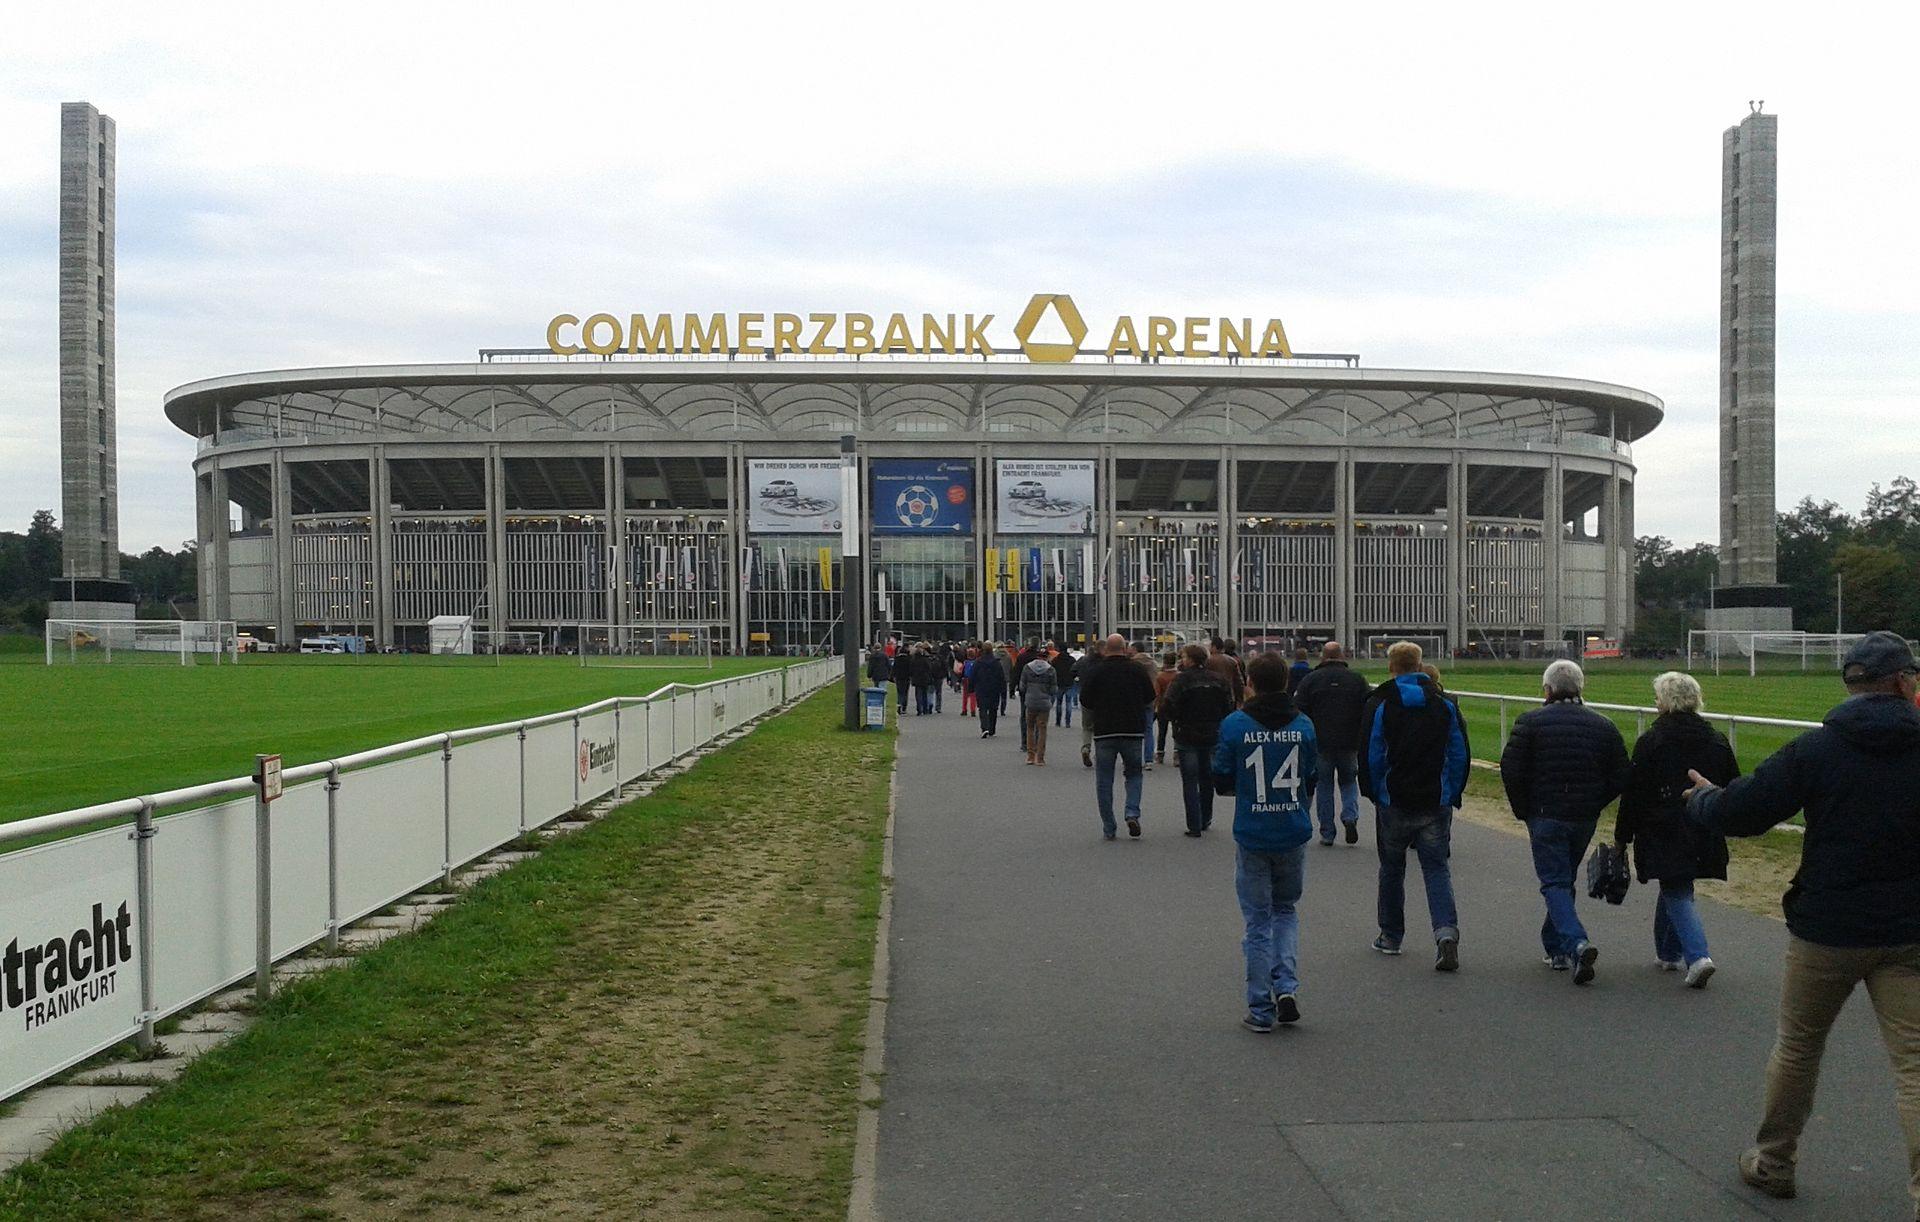 Image Source: https://en.wikipedia.org/wiki/Commerzbank-Arena#/media/File:130919-Commerzbank-Arena-Europa-League.jpg